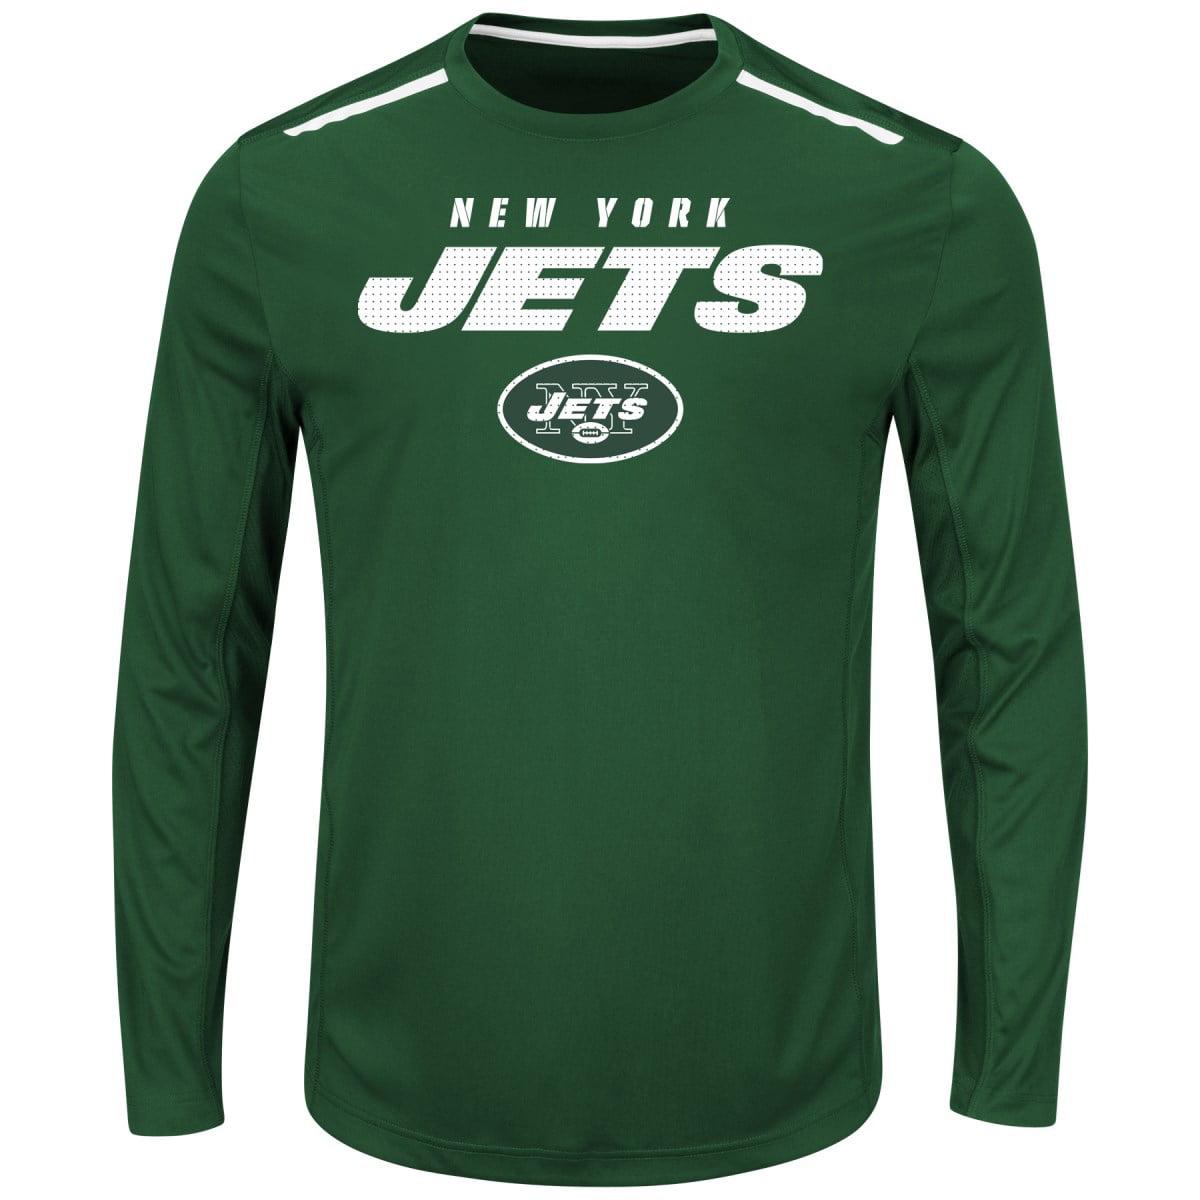 "New York Jets Majestic NFL ""Fanfare IX"" Men's Cool Base L S Shirt by Majestic"